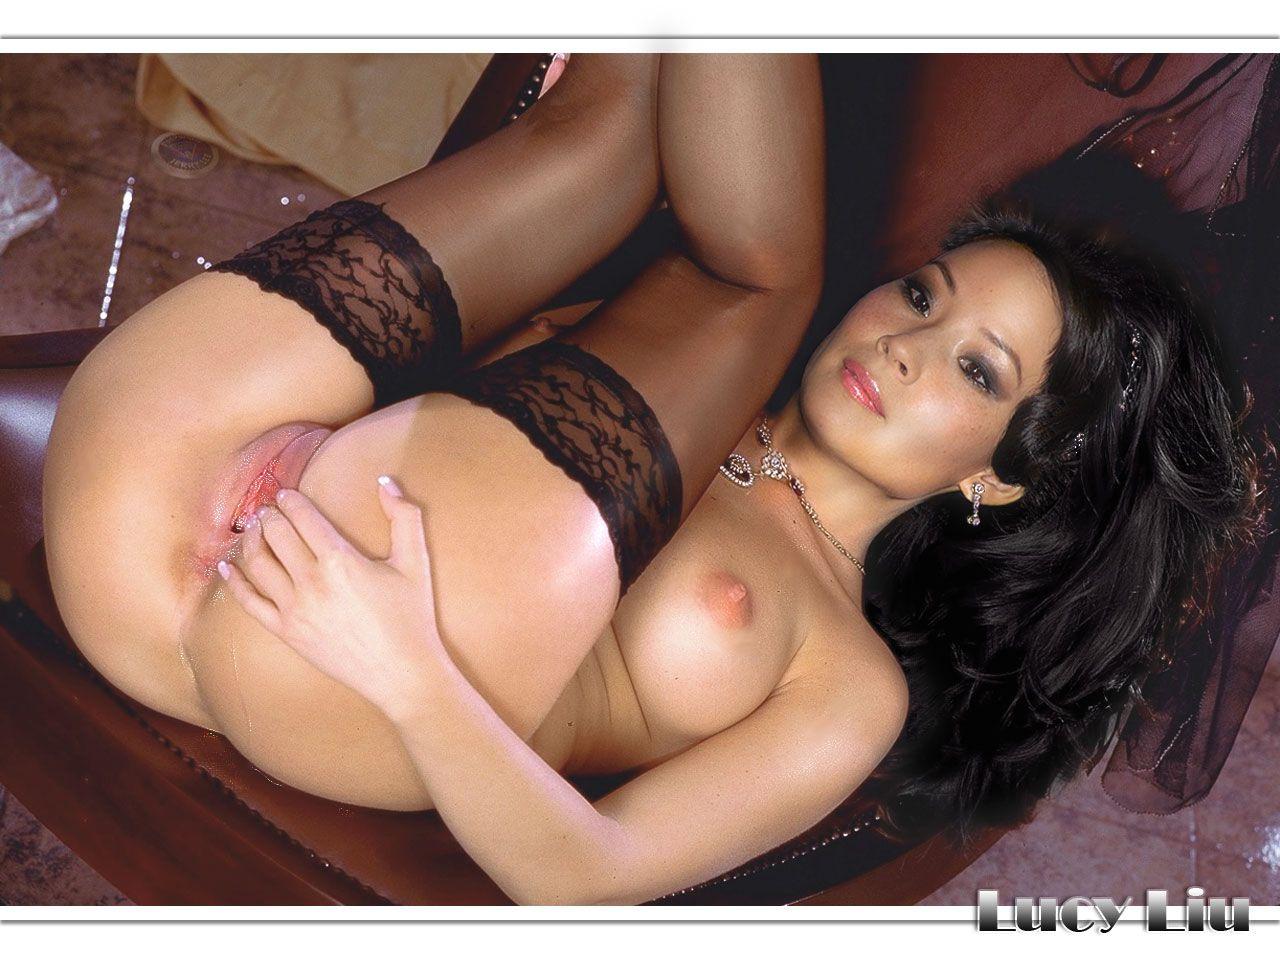 http://2.bp.blogspot.com/_zOJrgHDH5Qw/S7tu0BLY3cI/AAAAAAAAAM8/yTYf-0MmLTE/s1600/Lucy_Liu_0240.jpg